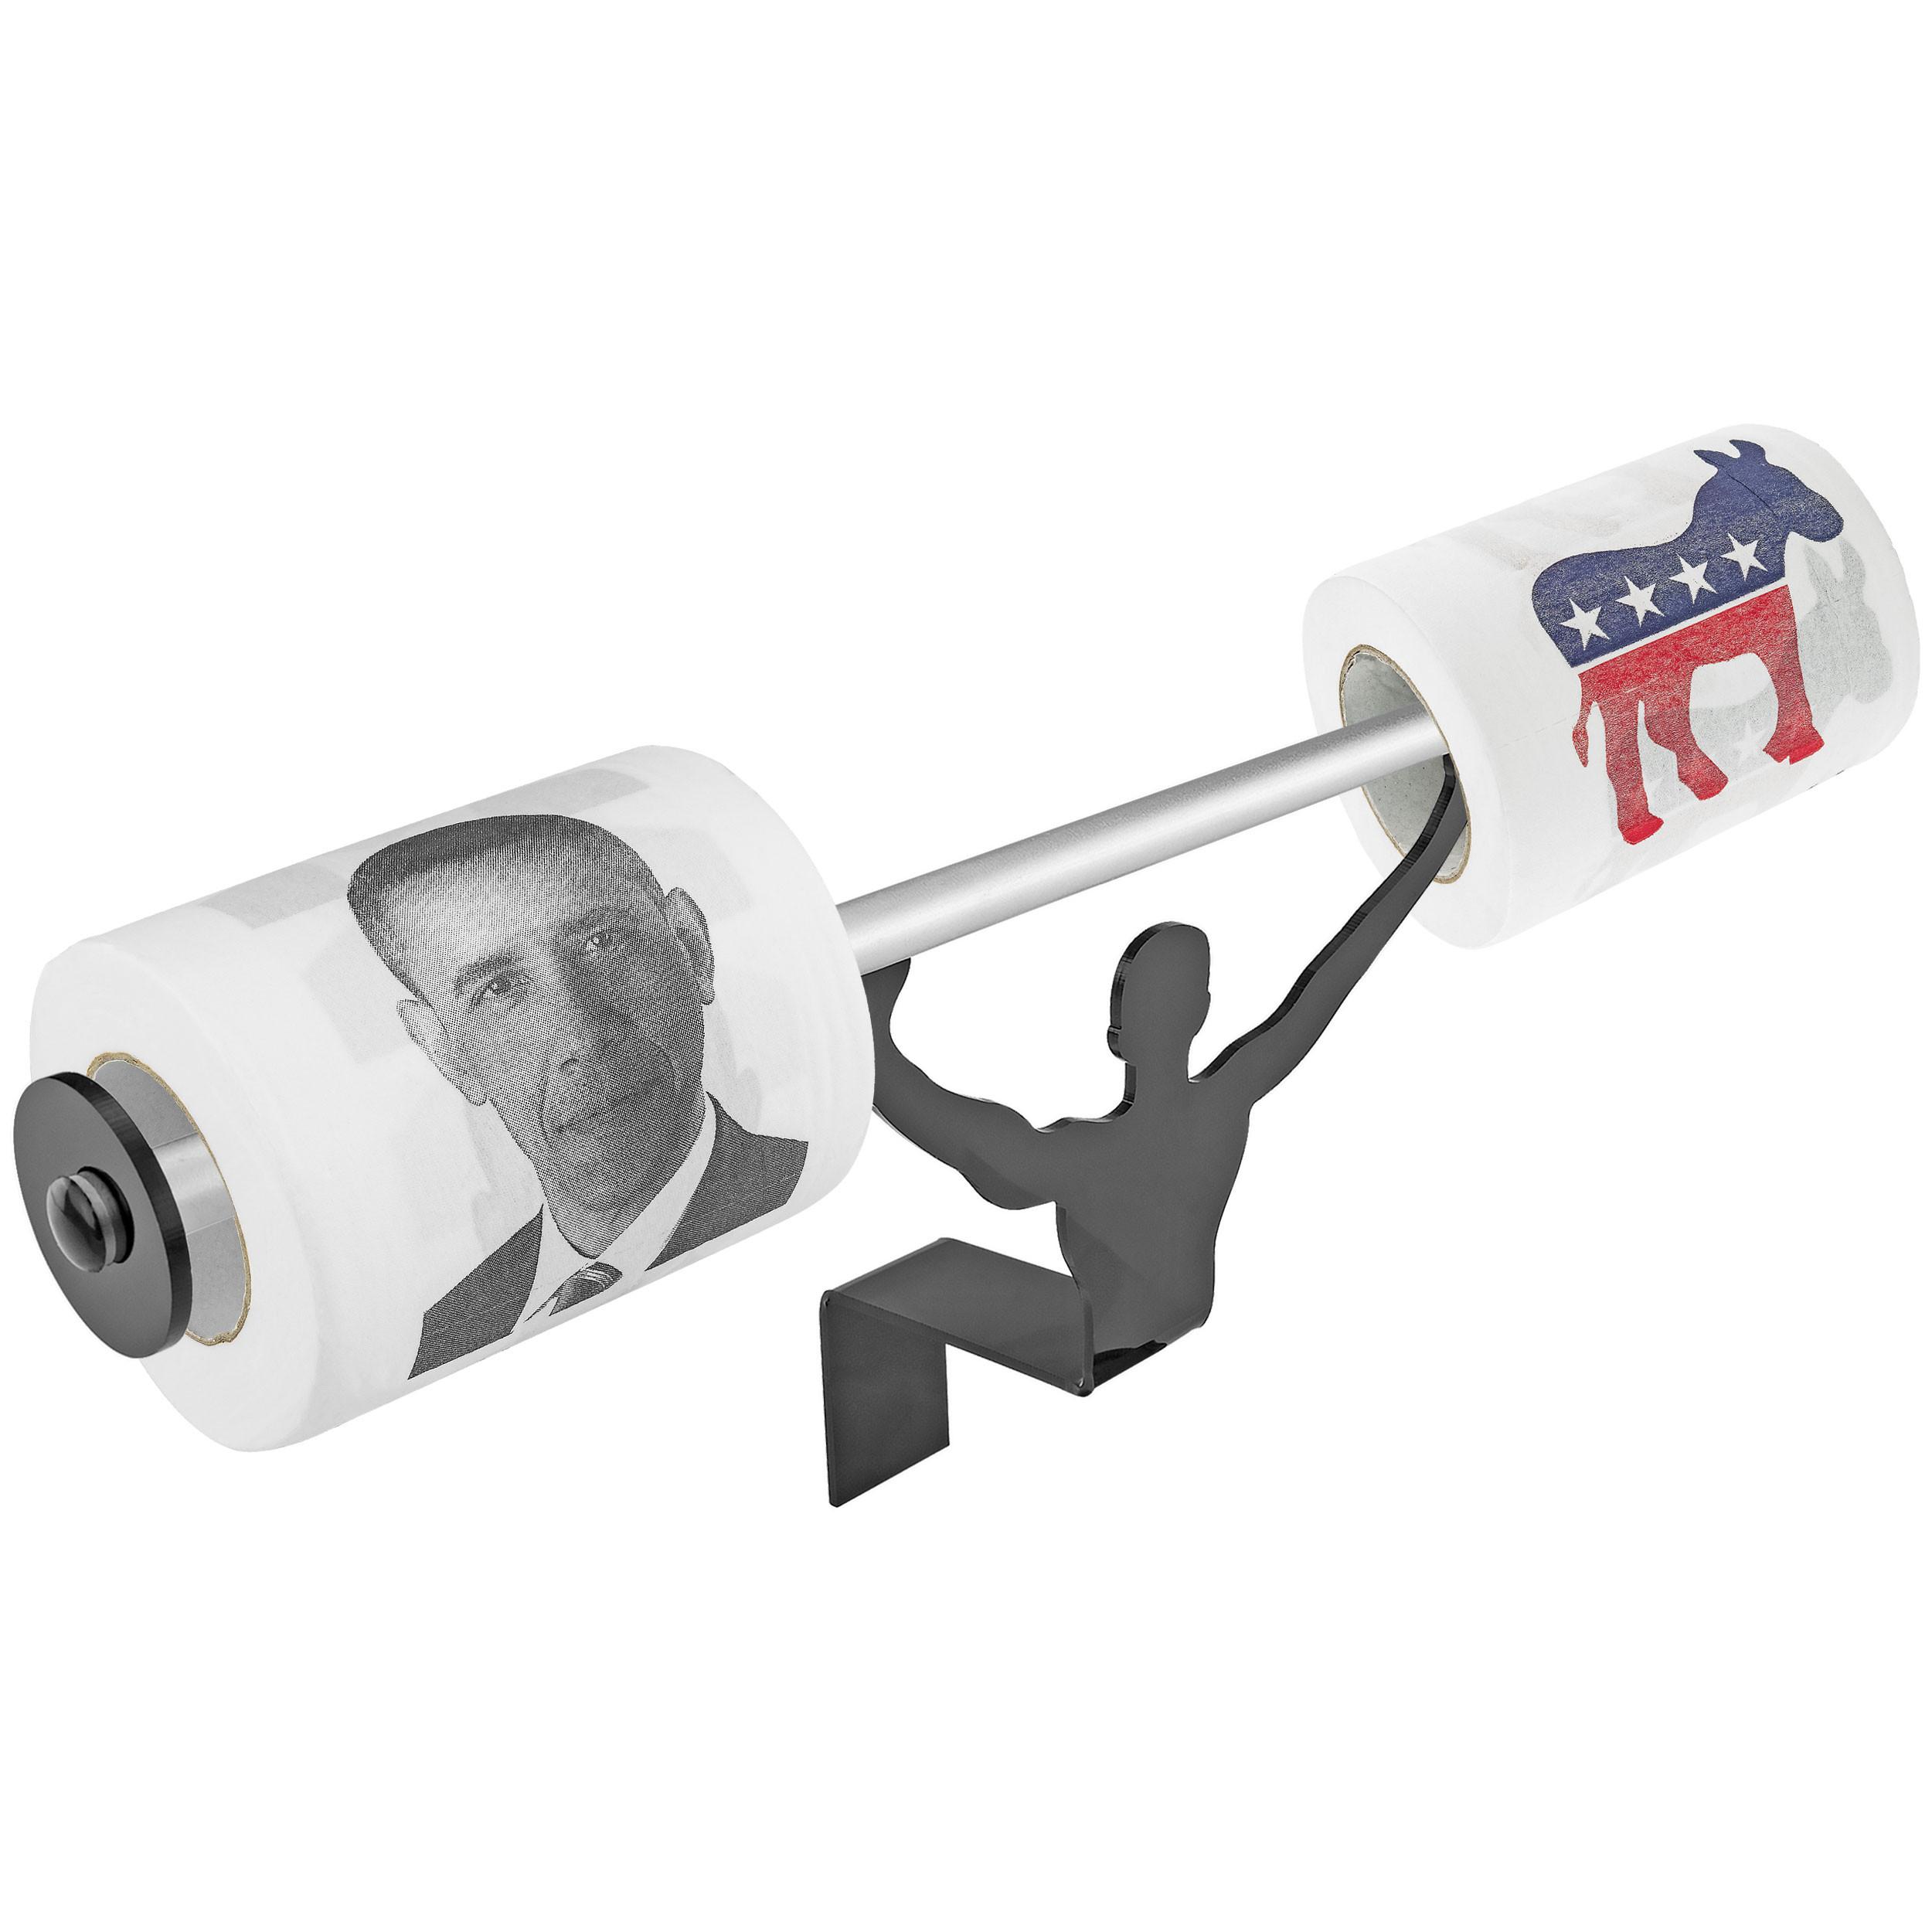 Fairly Odd Novelties Barack Obama & Democrat Logo Novelty Toilet Paper w/Strong Man Holder Funny Liberal Gift Set